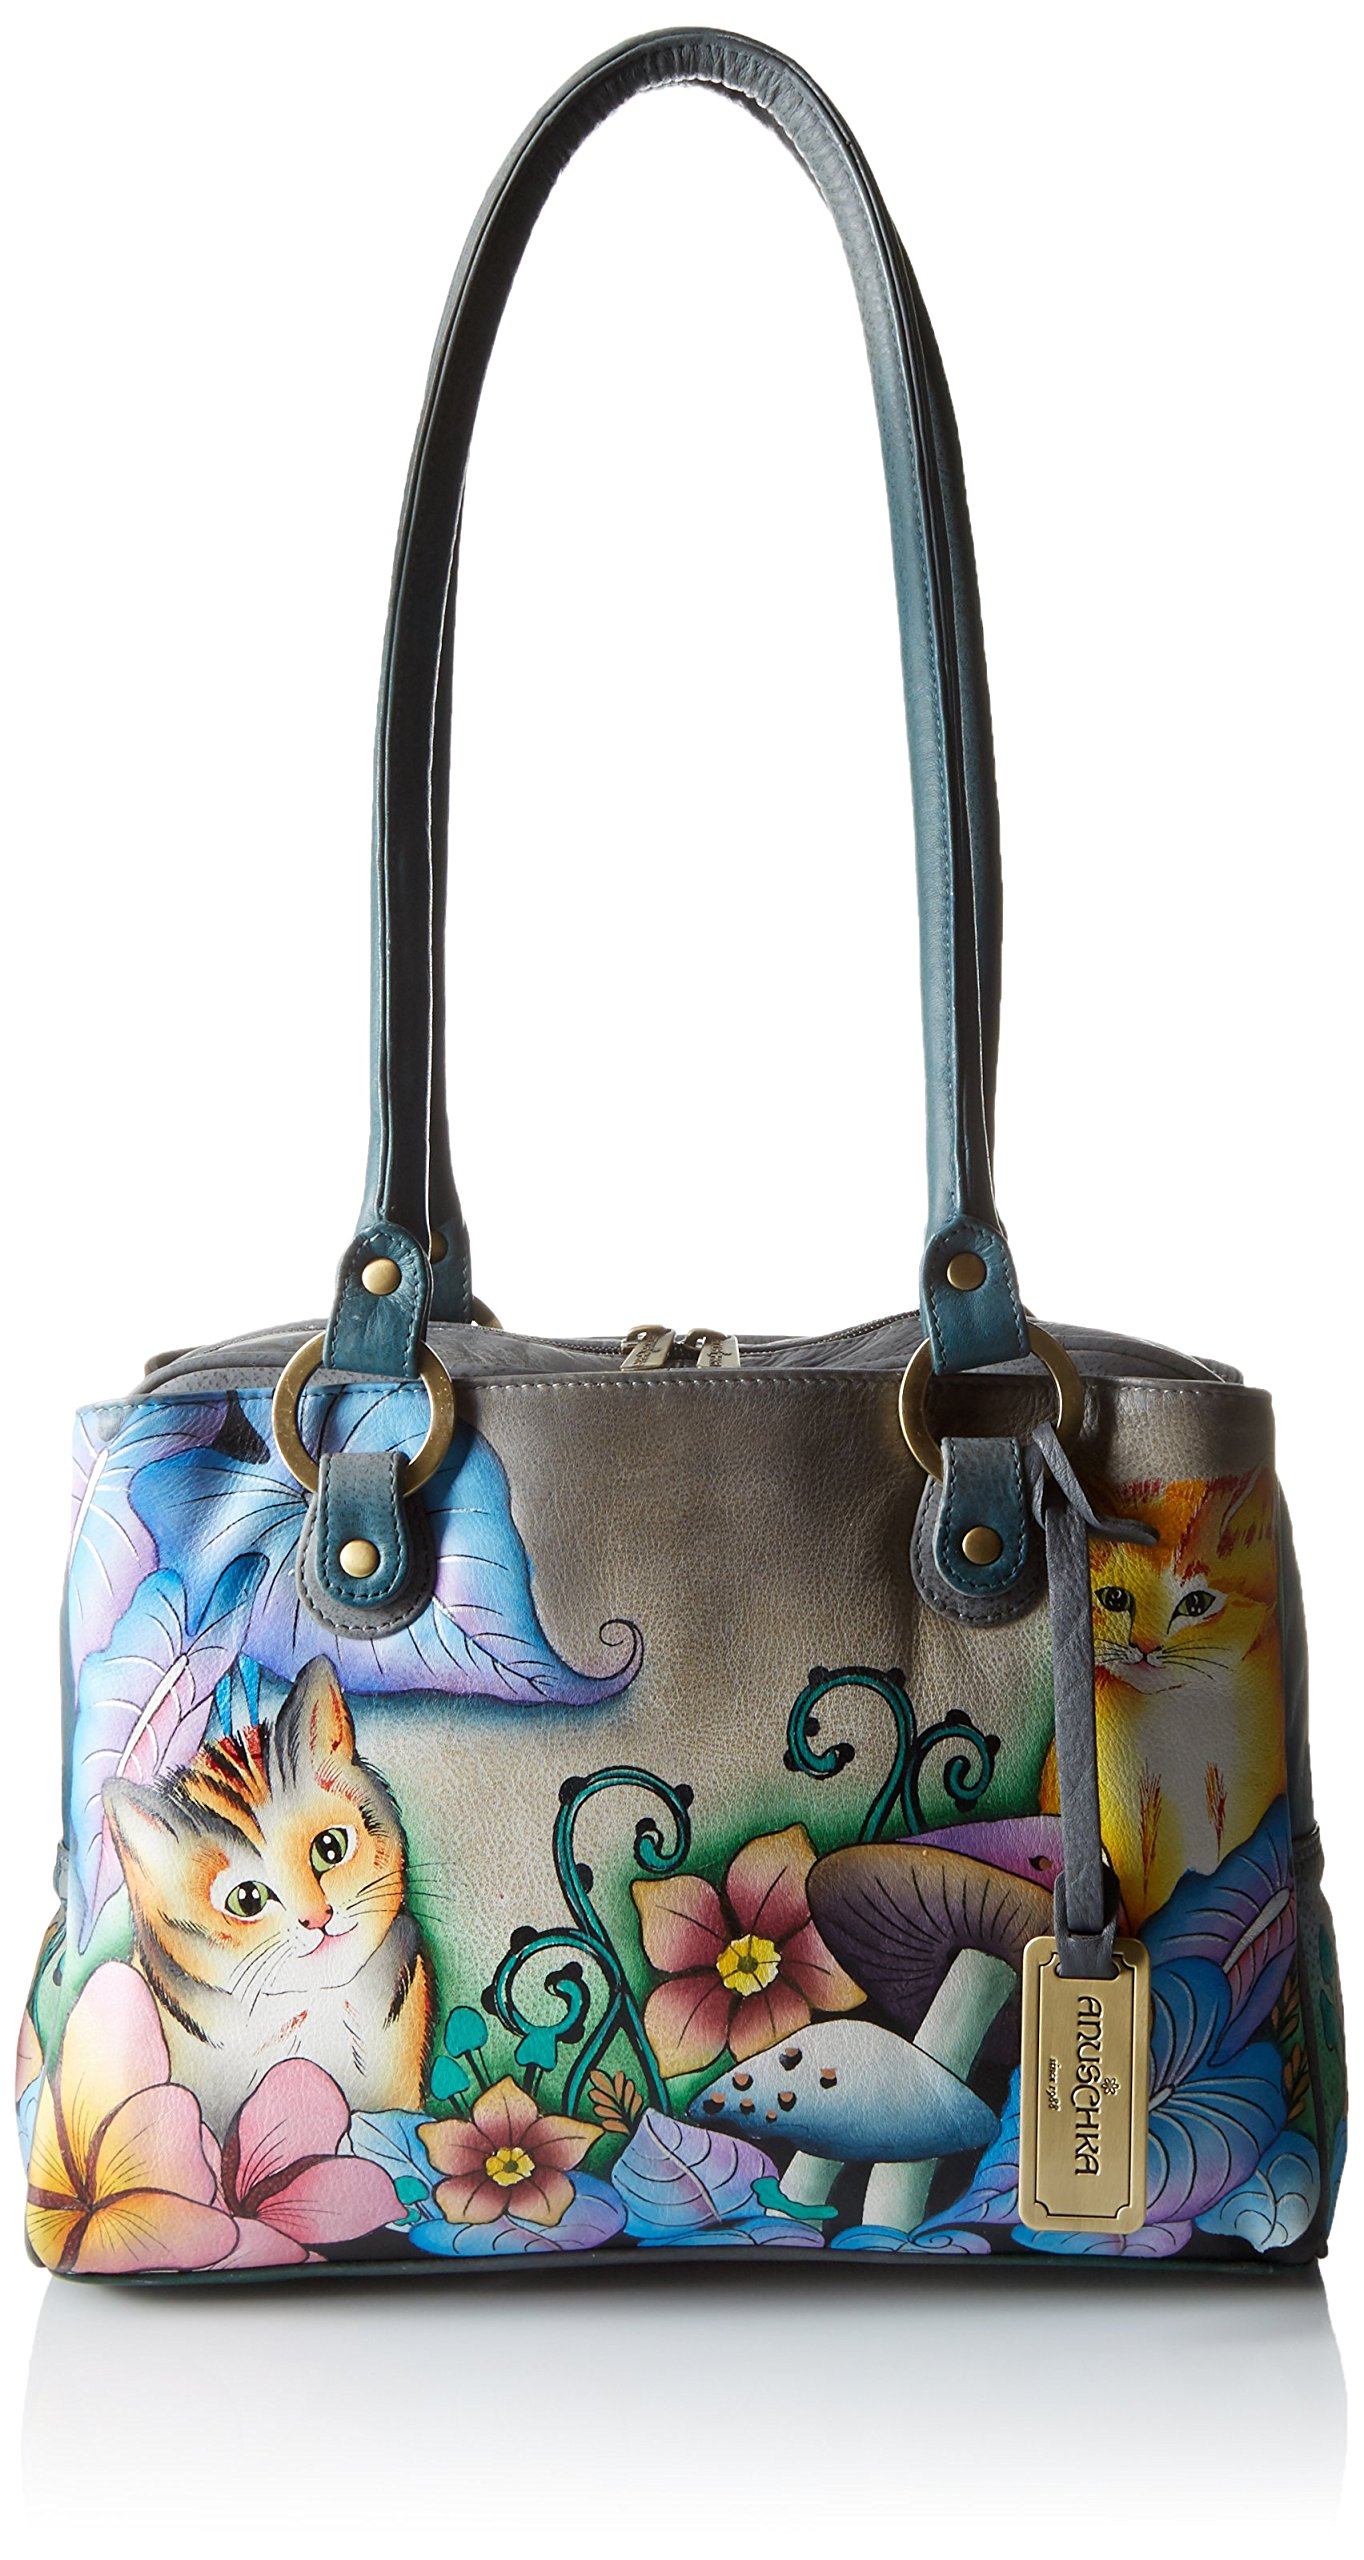 Anuschka Handpainted Leather Triple Compartment Medium Satchel, Cats in Wonderland